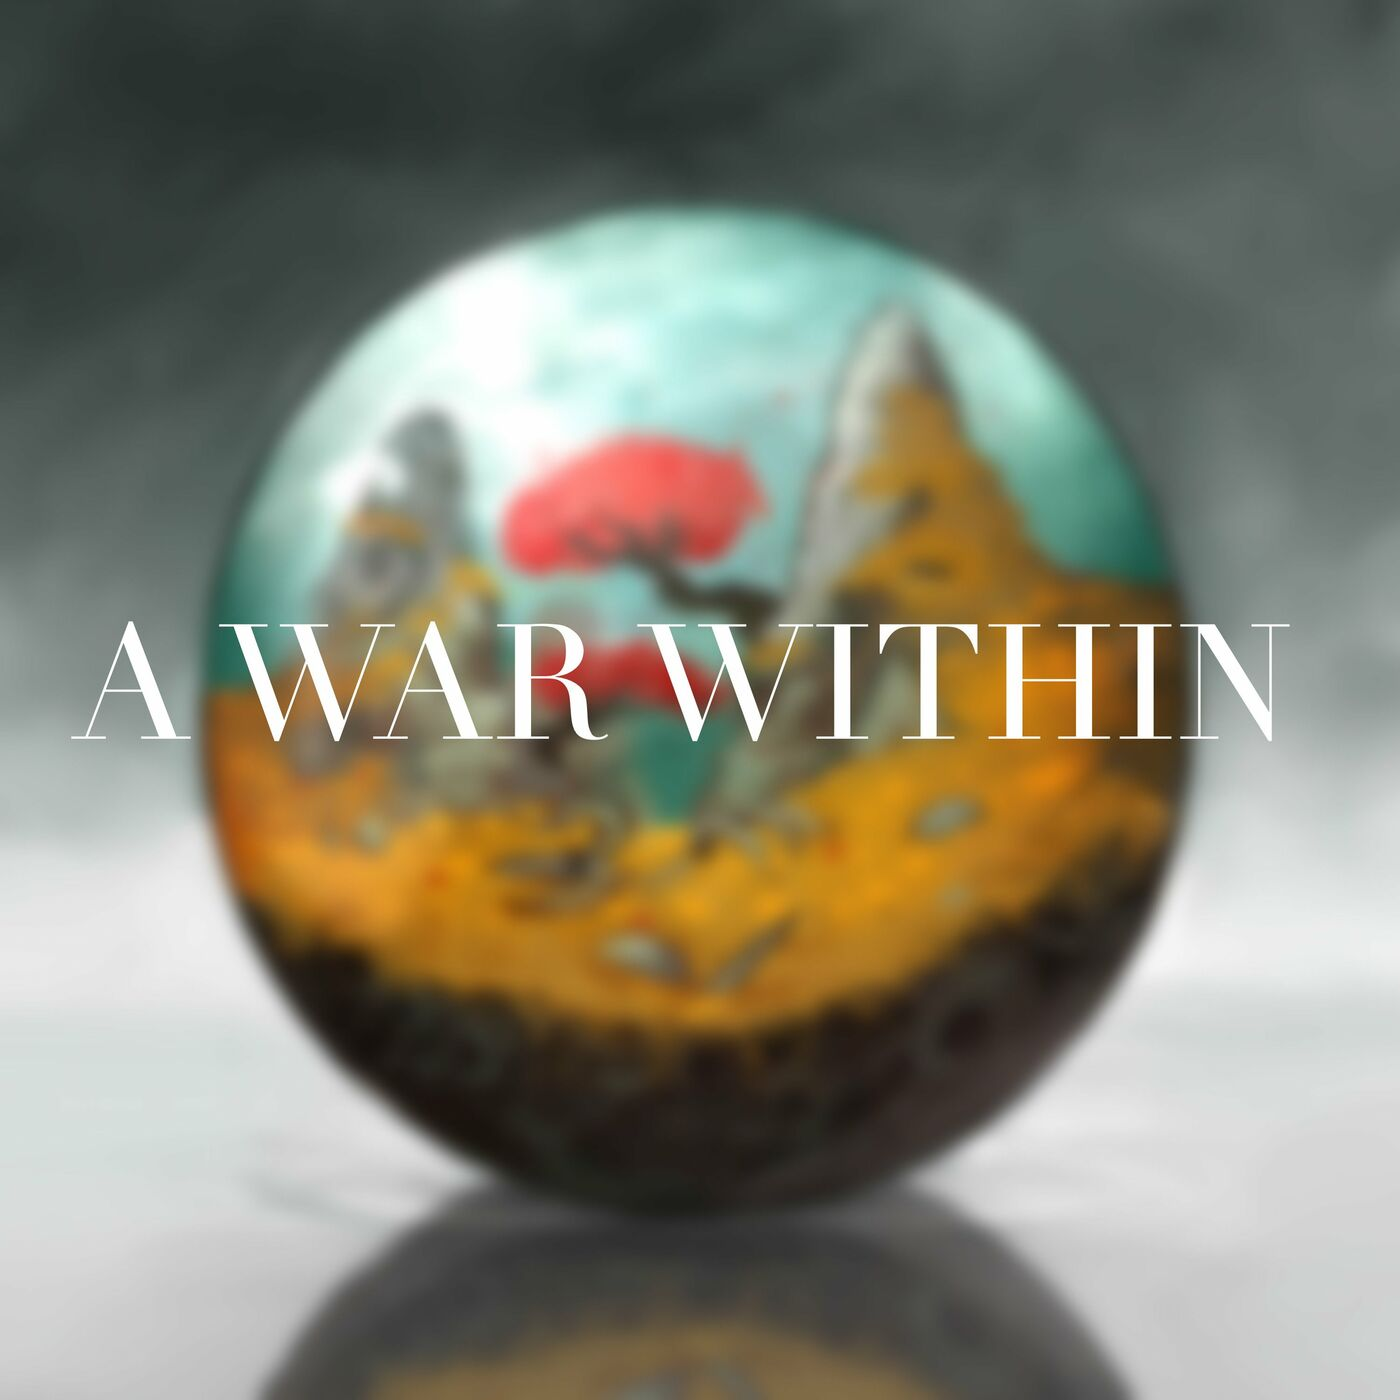 Makena - A War Within [single] (2021)